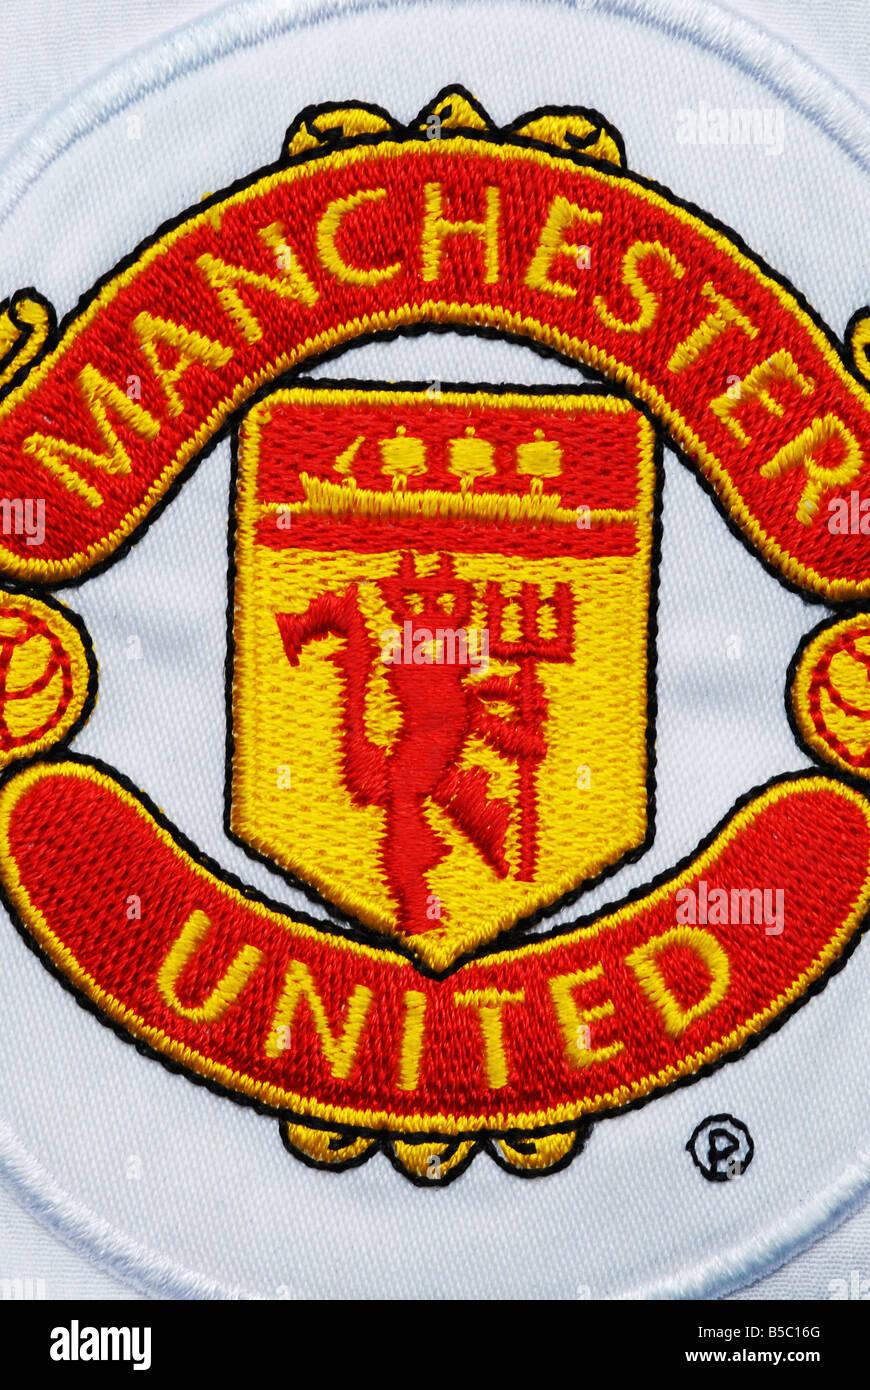 Manchester United Badge Stock Photo Alamy